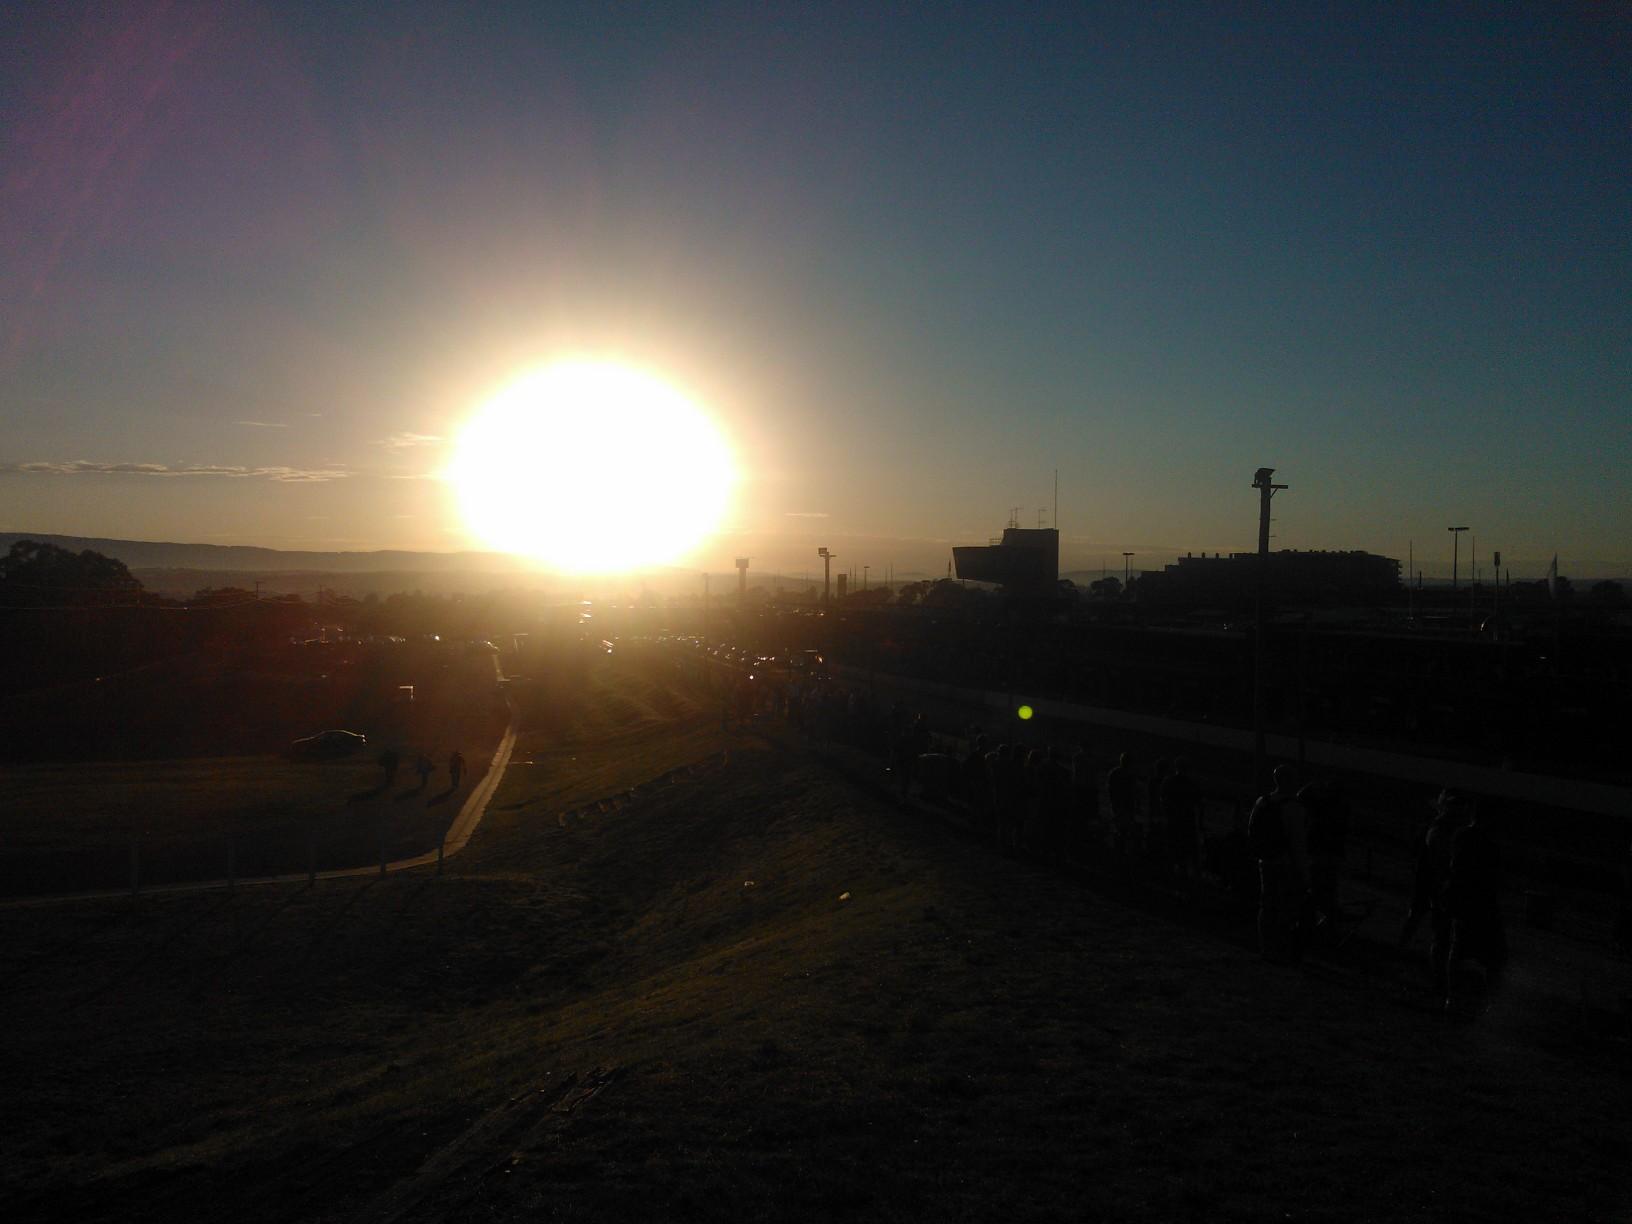 bathurst_sunrise_2013_12_hour